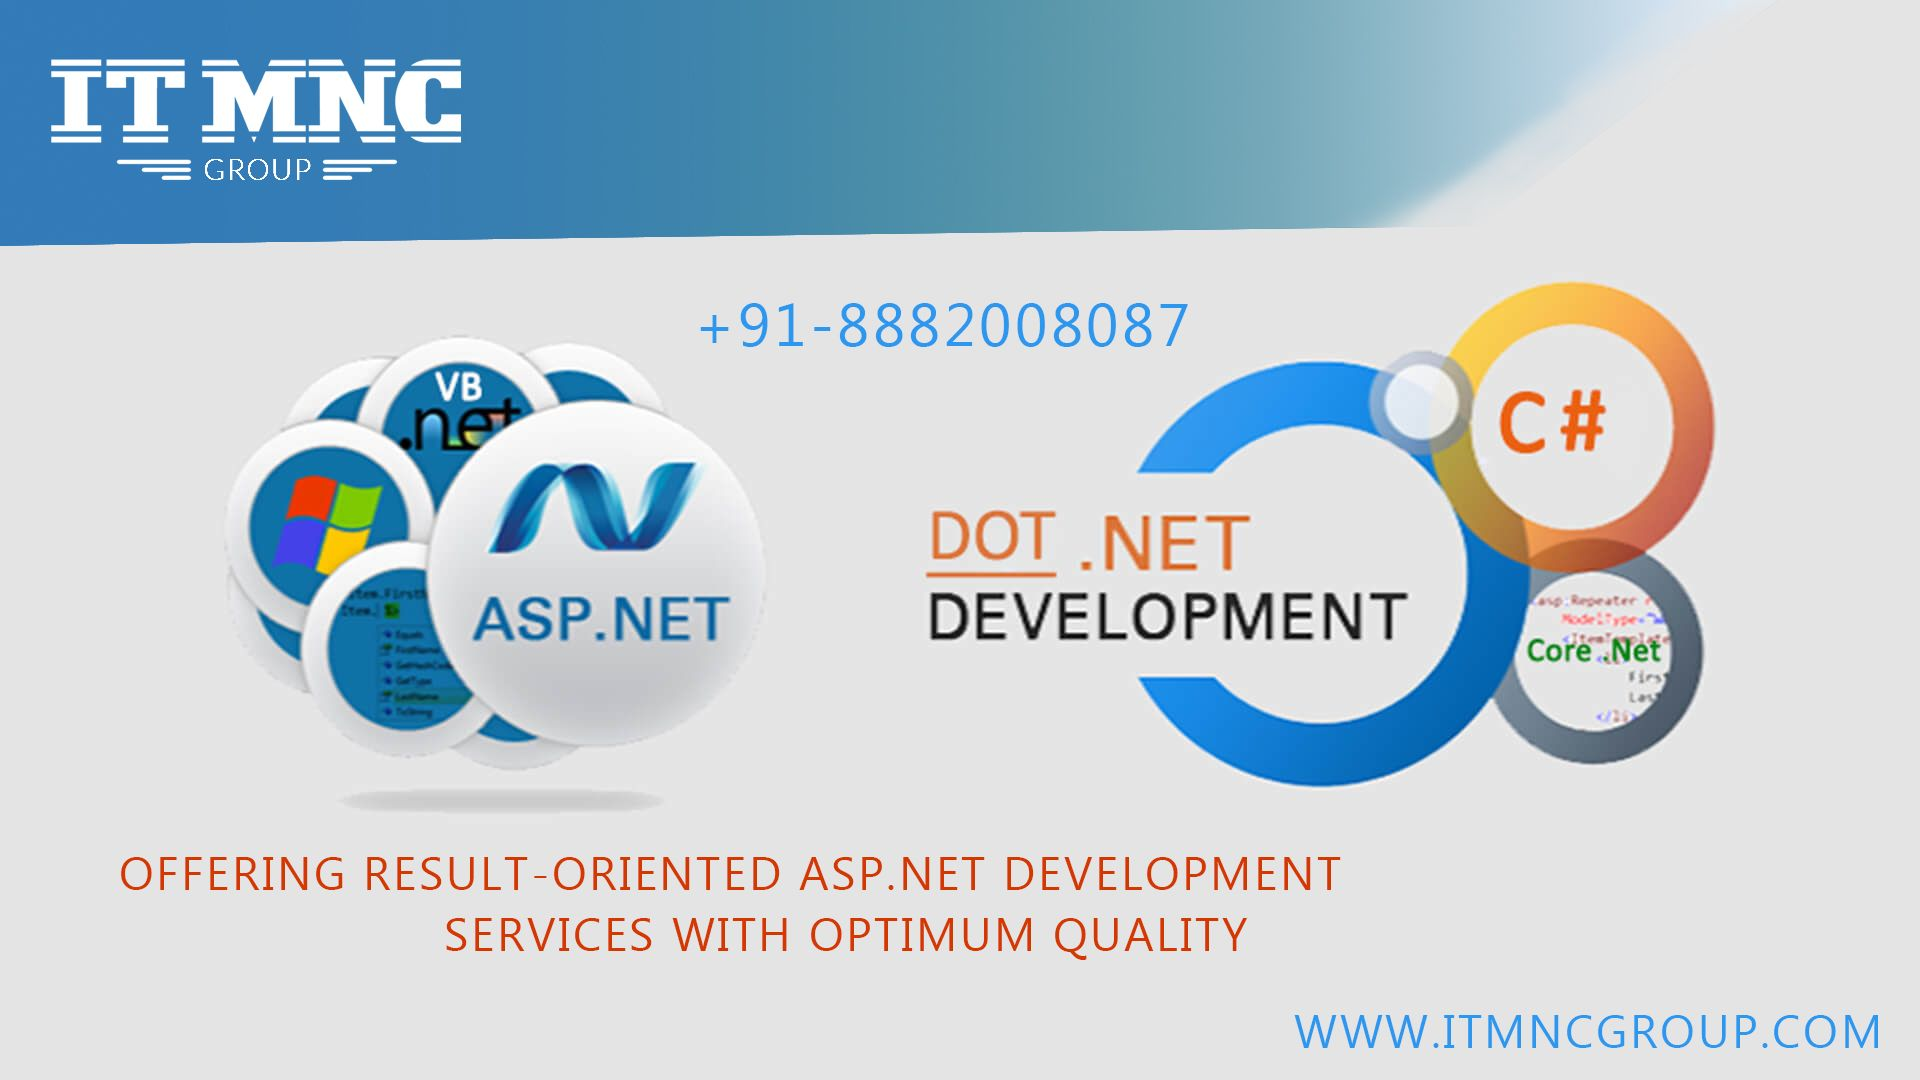 ASP  NET Development Company - ITMNC is a best asp  net